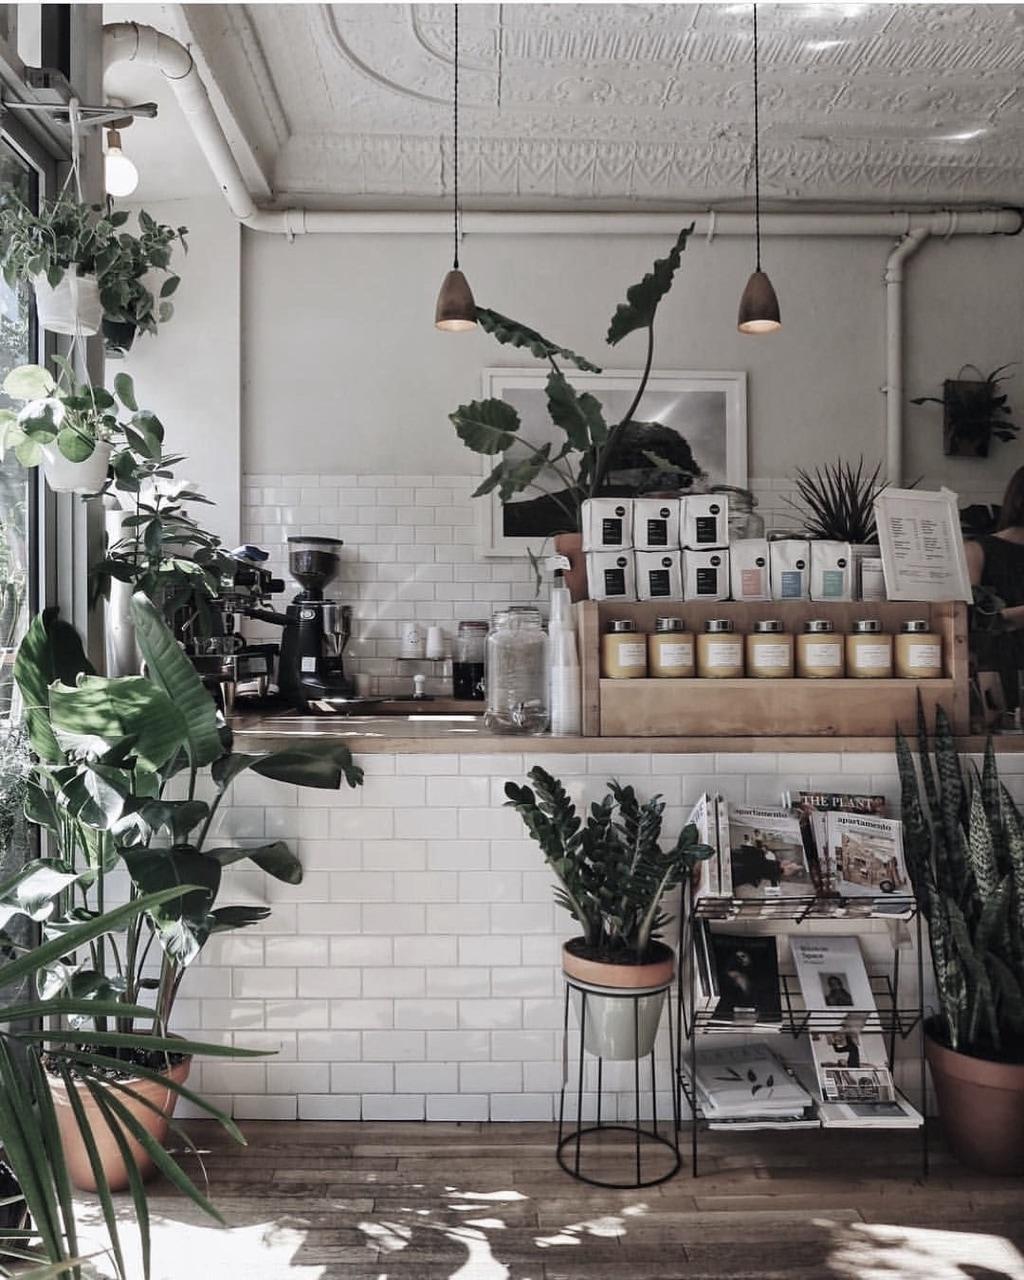 Cute Cafe Uploaded By 𝙱𝚒𝚊𝚗𝚌𝚊 On We Heart It